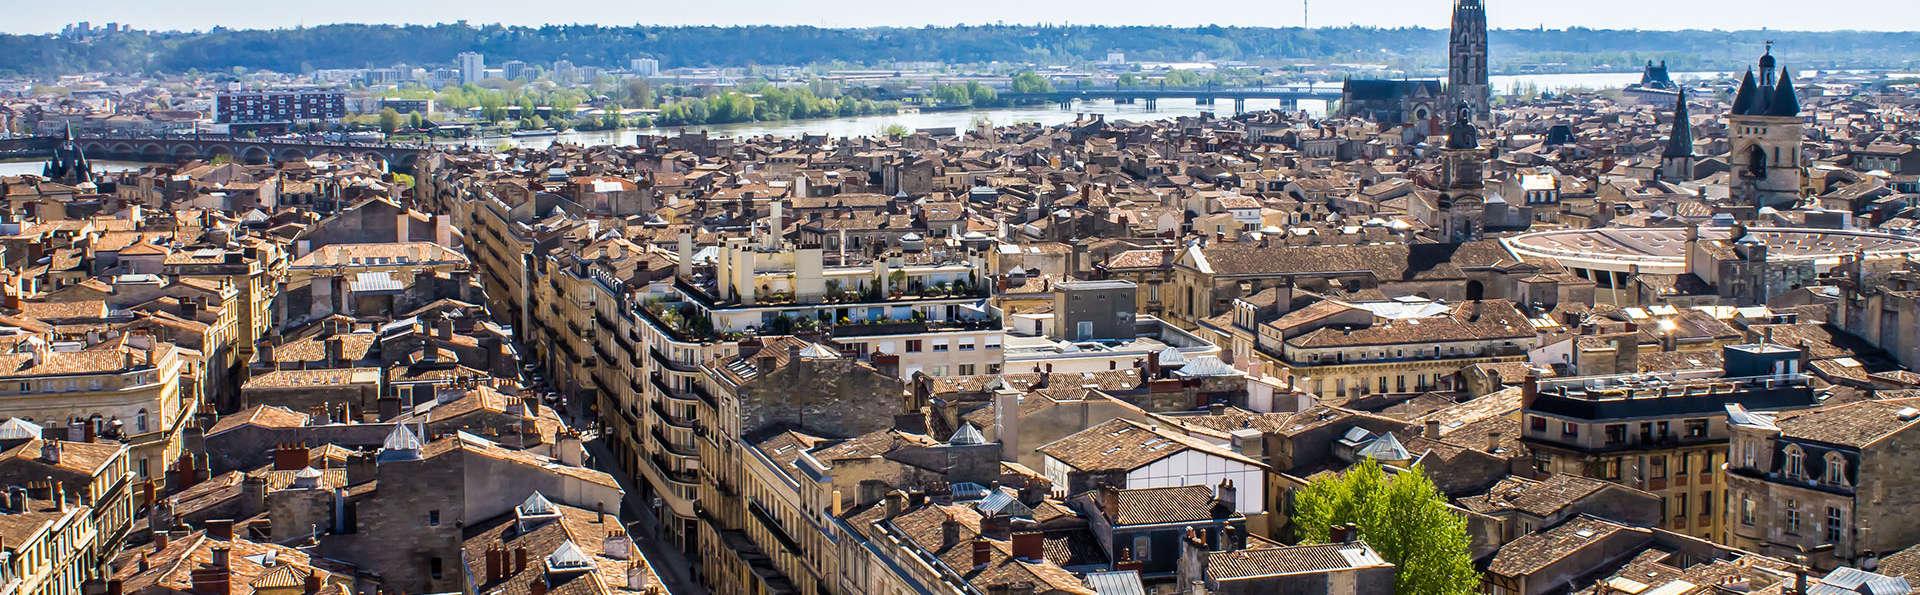 Villa Segur Bordeaux - EDIT_BORDEAUX_13.jpg